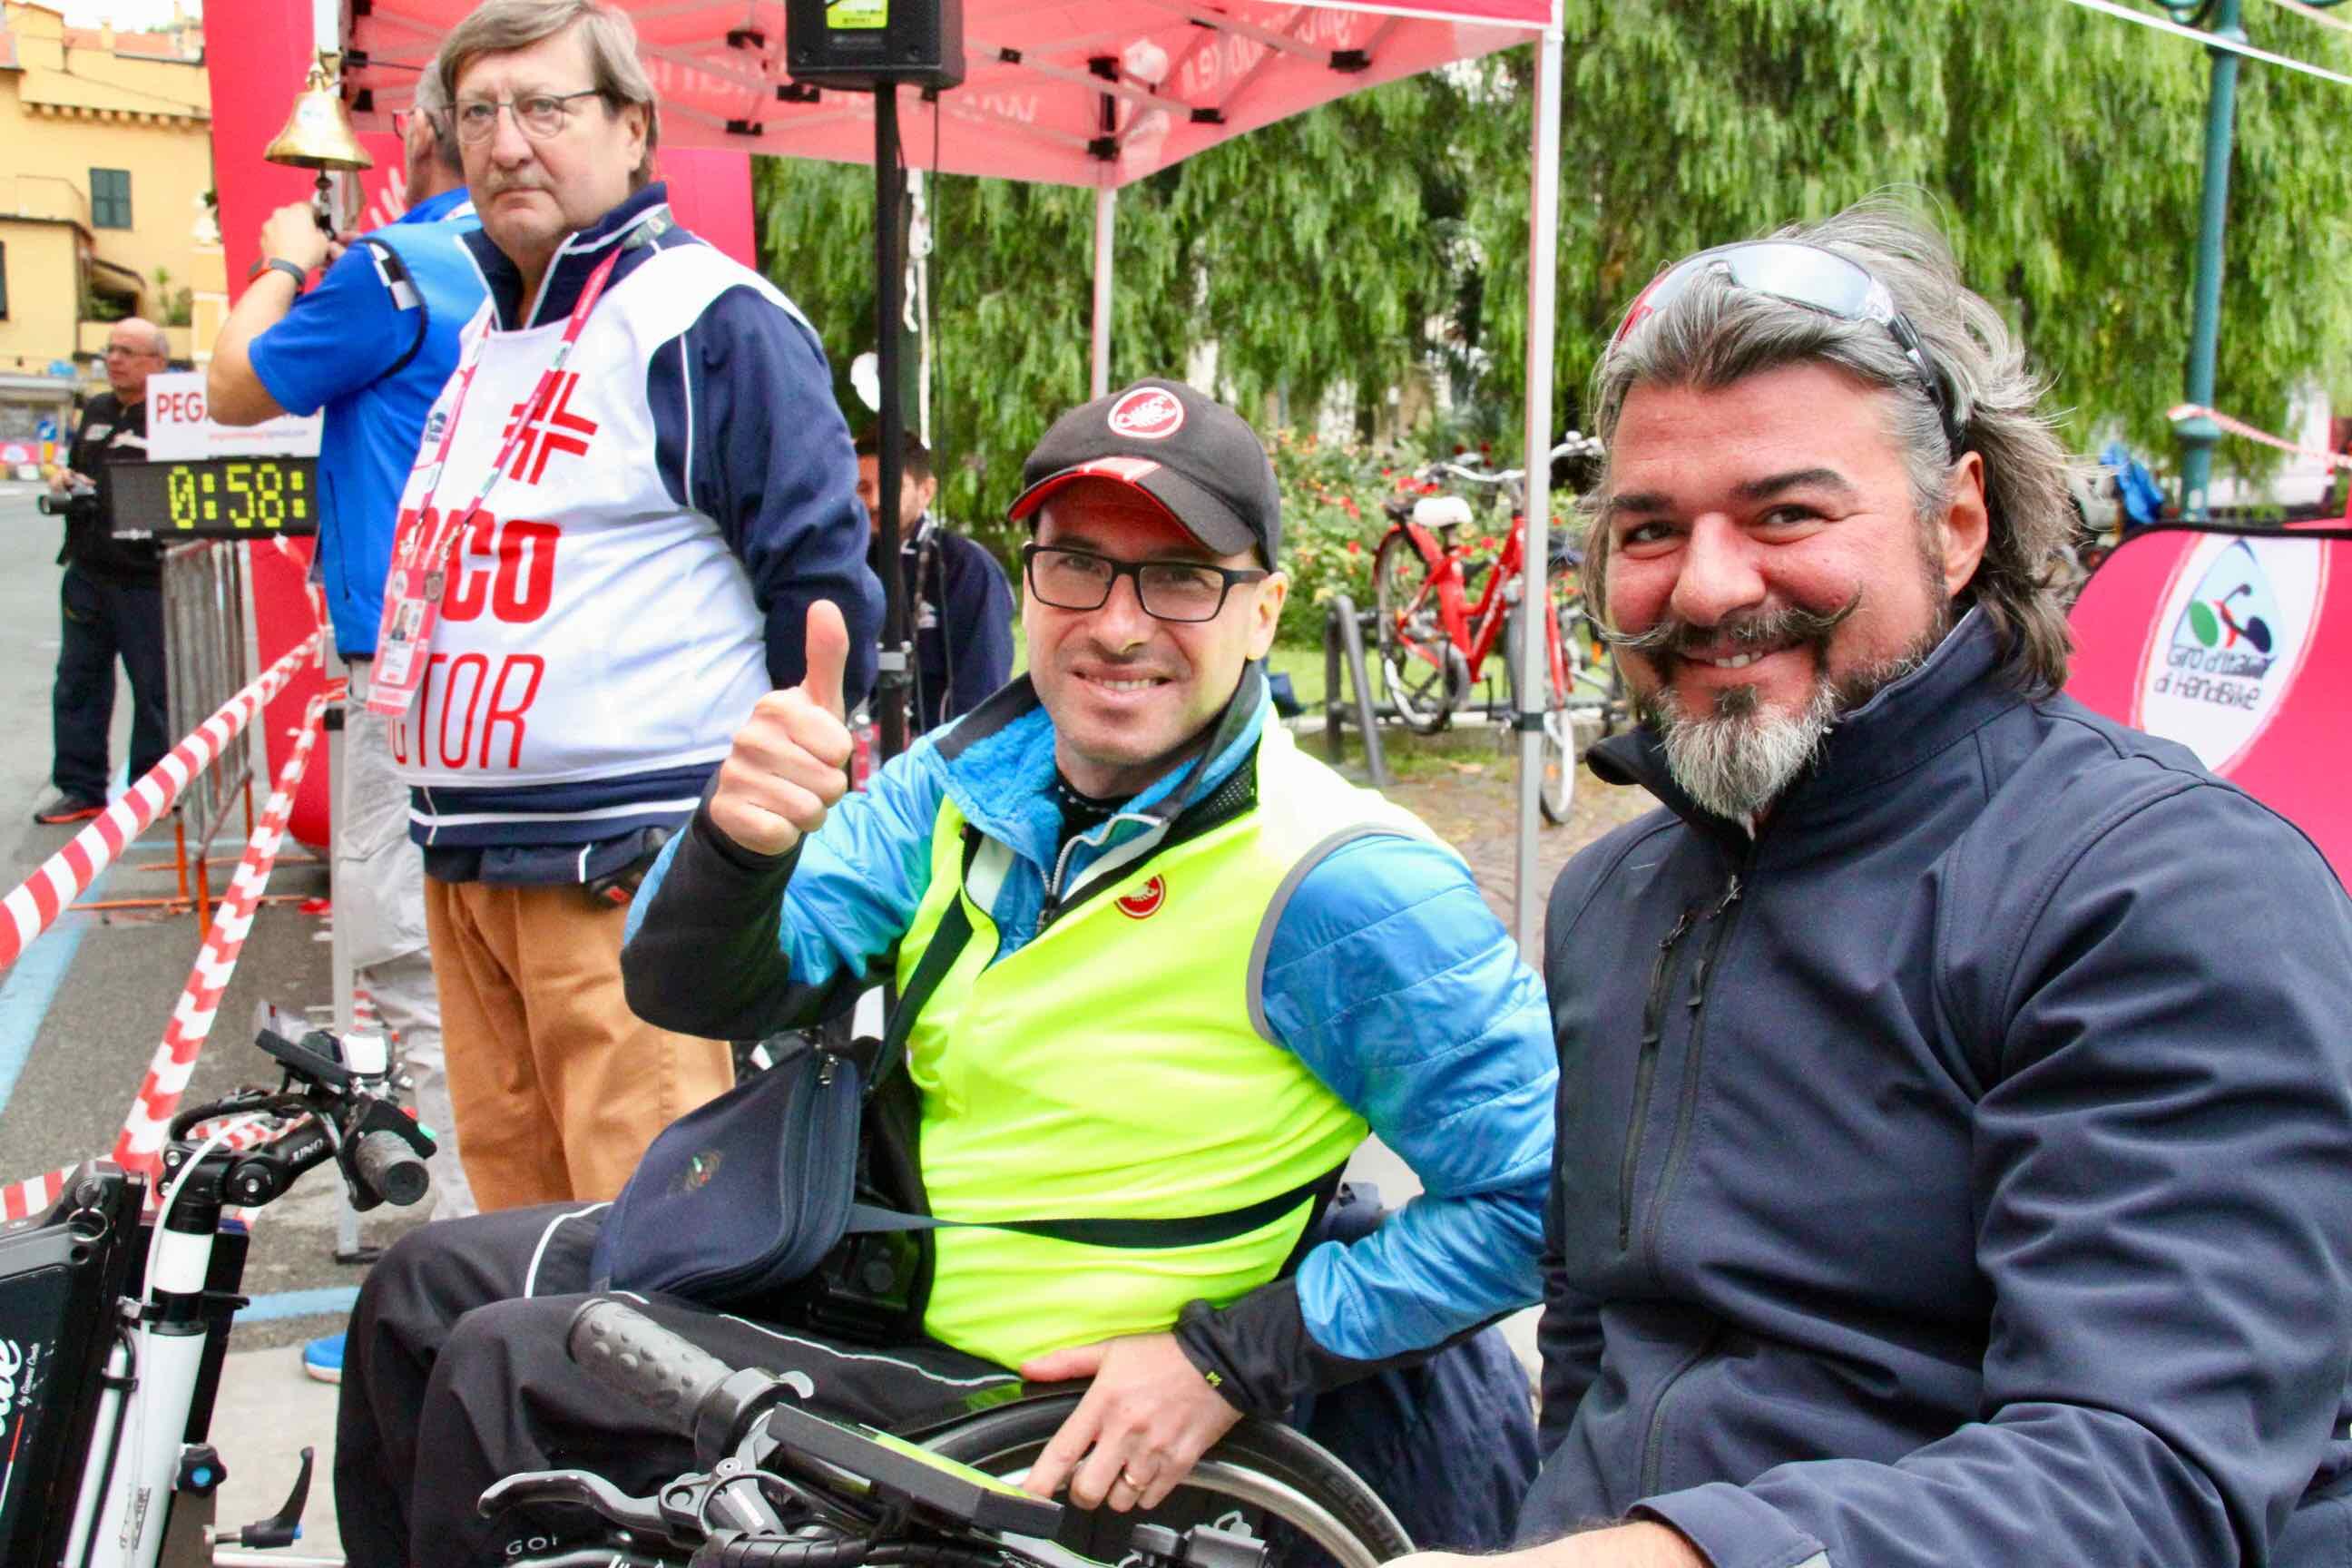 1° Memorial don Nando Negri a Chiavari per il Giro d'Italia Handbike 2018 - 8